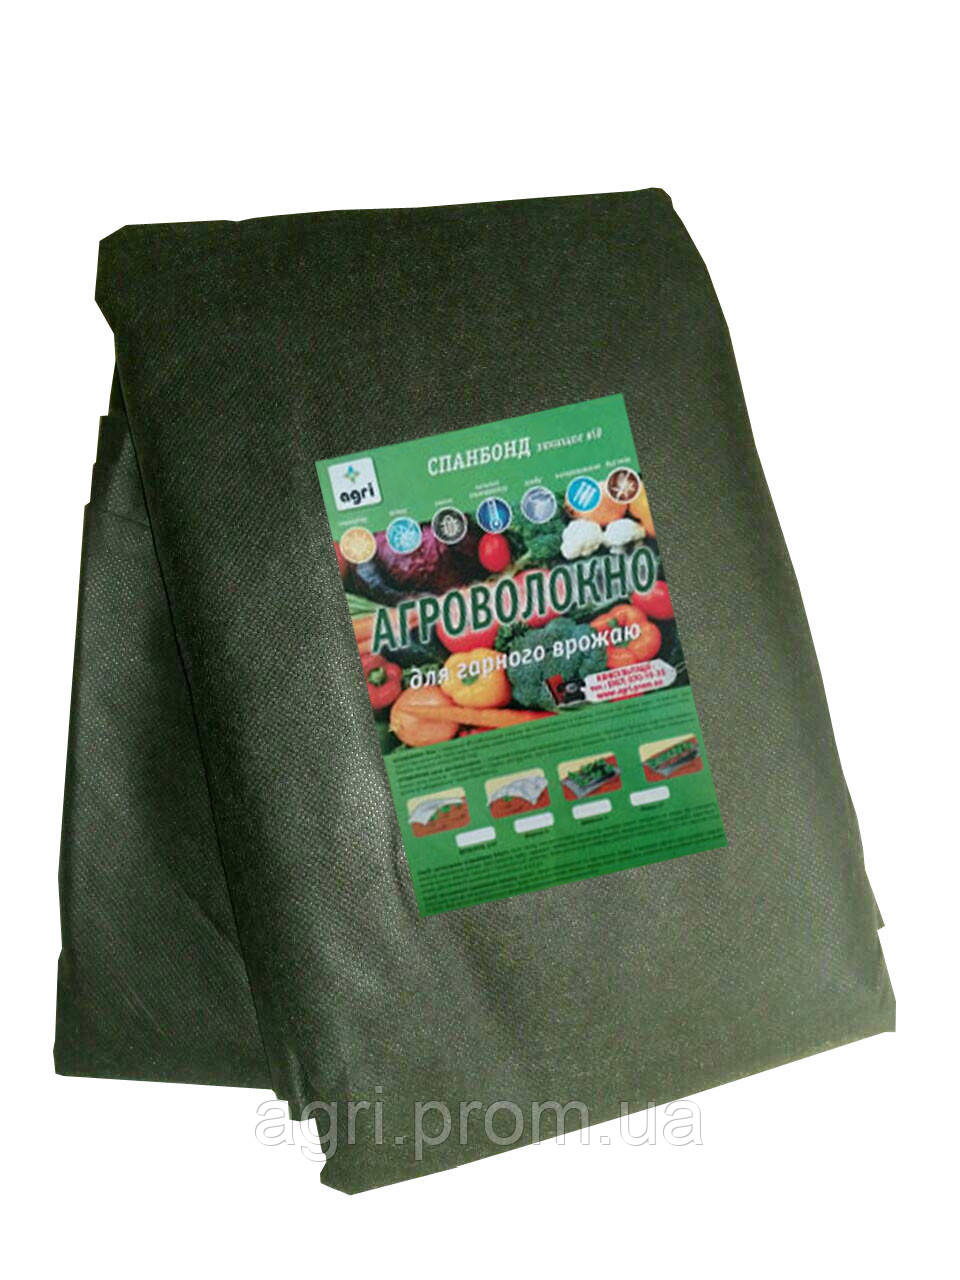 Агроволокно Агротекс 60 г/м2 (1,6 м*7м) чорне мульчуюче